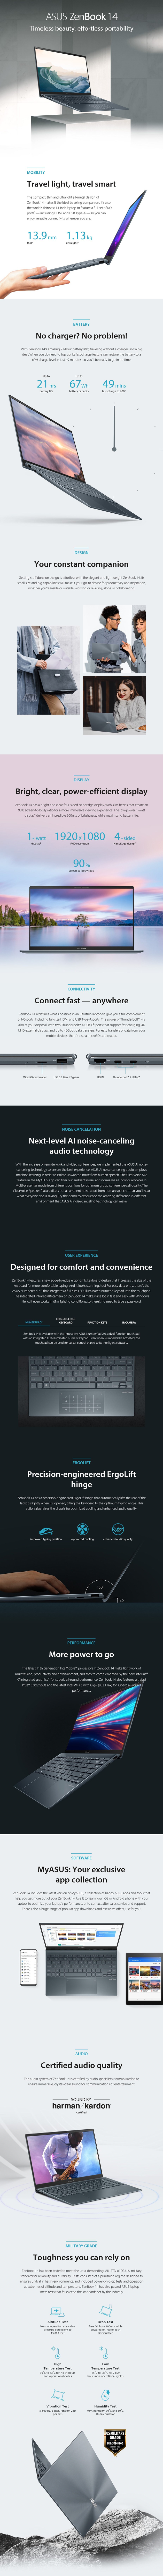 "ASUS ZenBook 14 UX425EA 14"" Laptop i5-1135G7 8GB 512GB W10P - Grey - Overview 1"